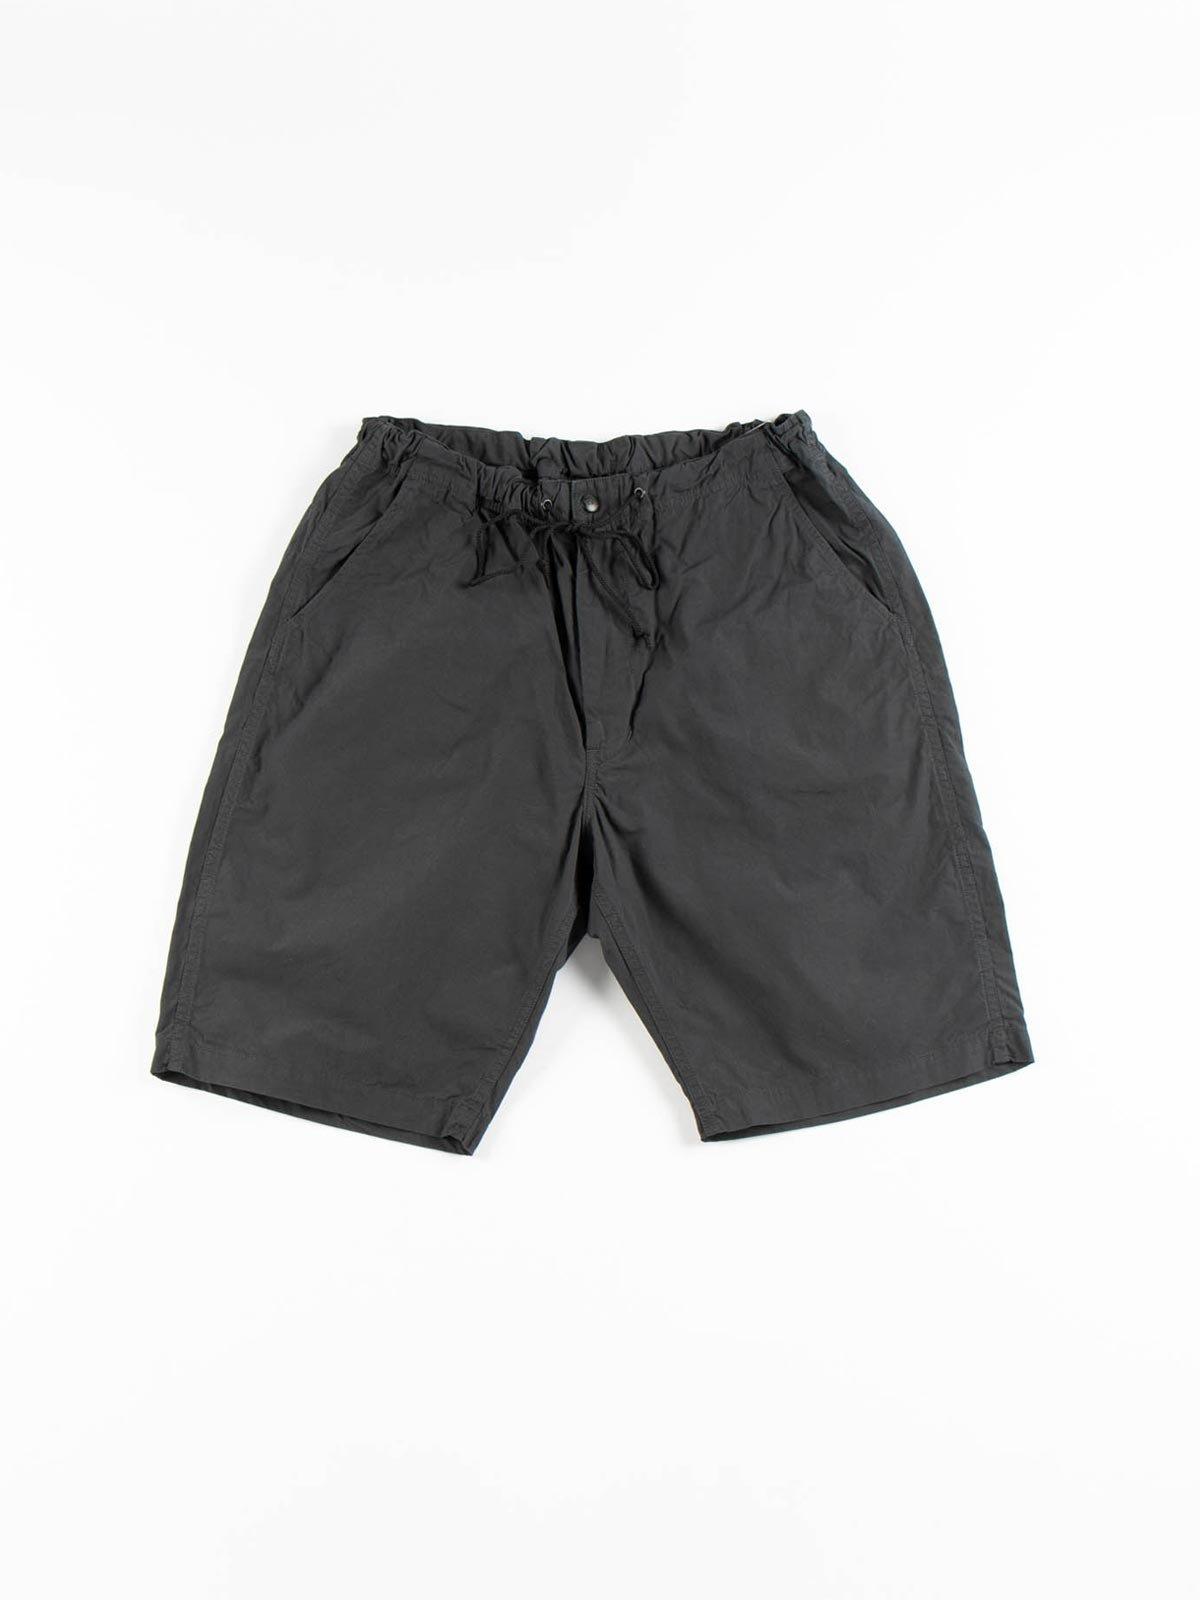 NEW YORKER SHORTS GRAY COTTON TYPEWRITER CLOTH - Image 1